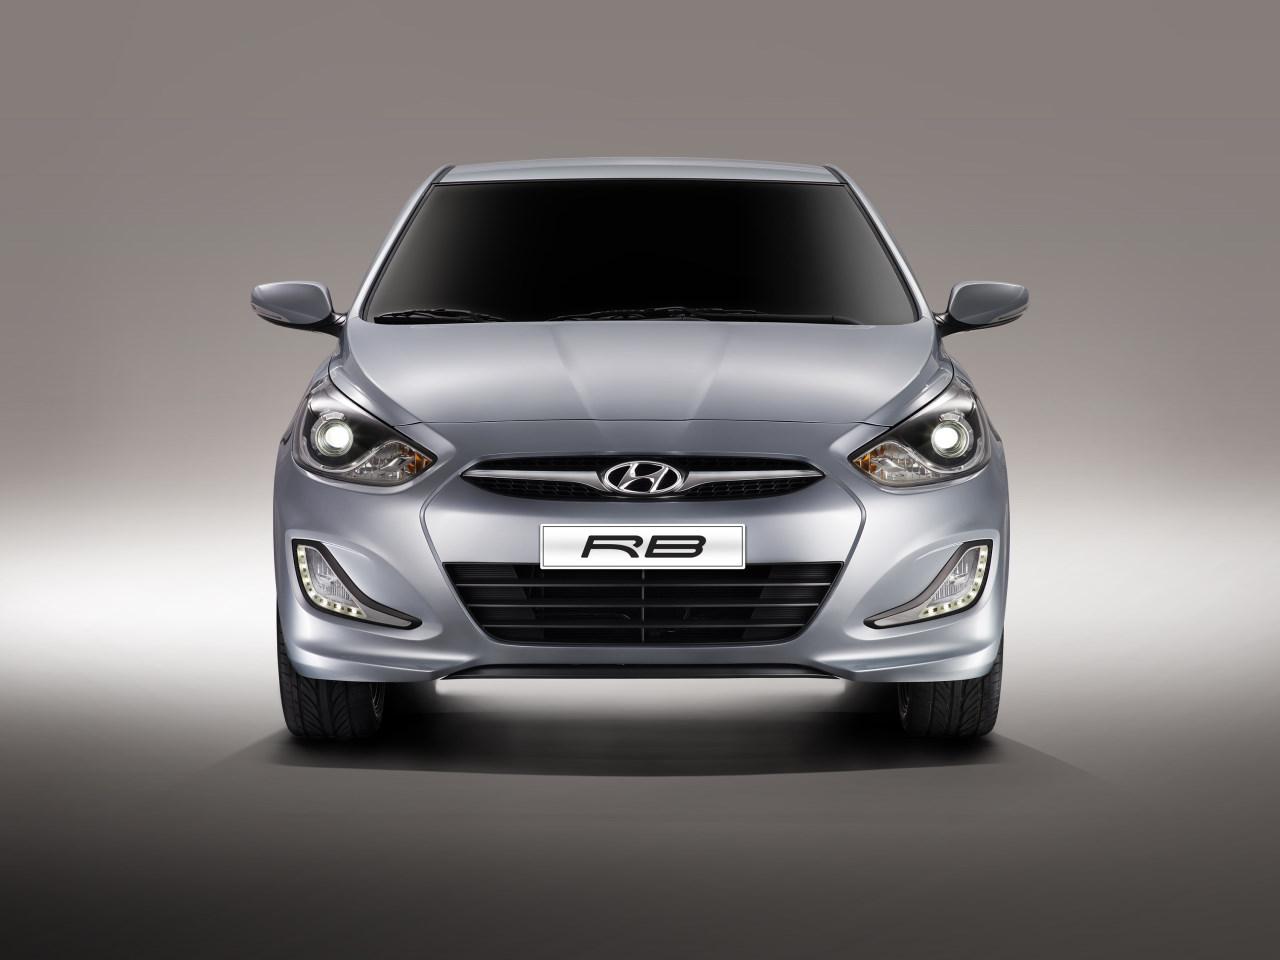 2010 Hyundai Rb Concepts Elantra Wiring Diagram